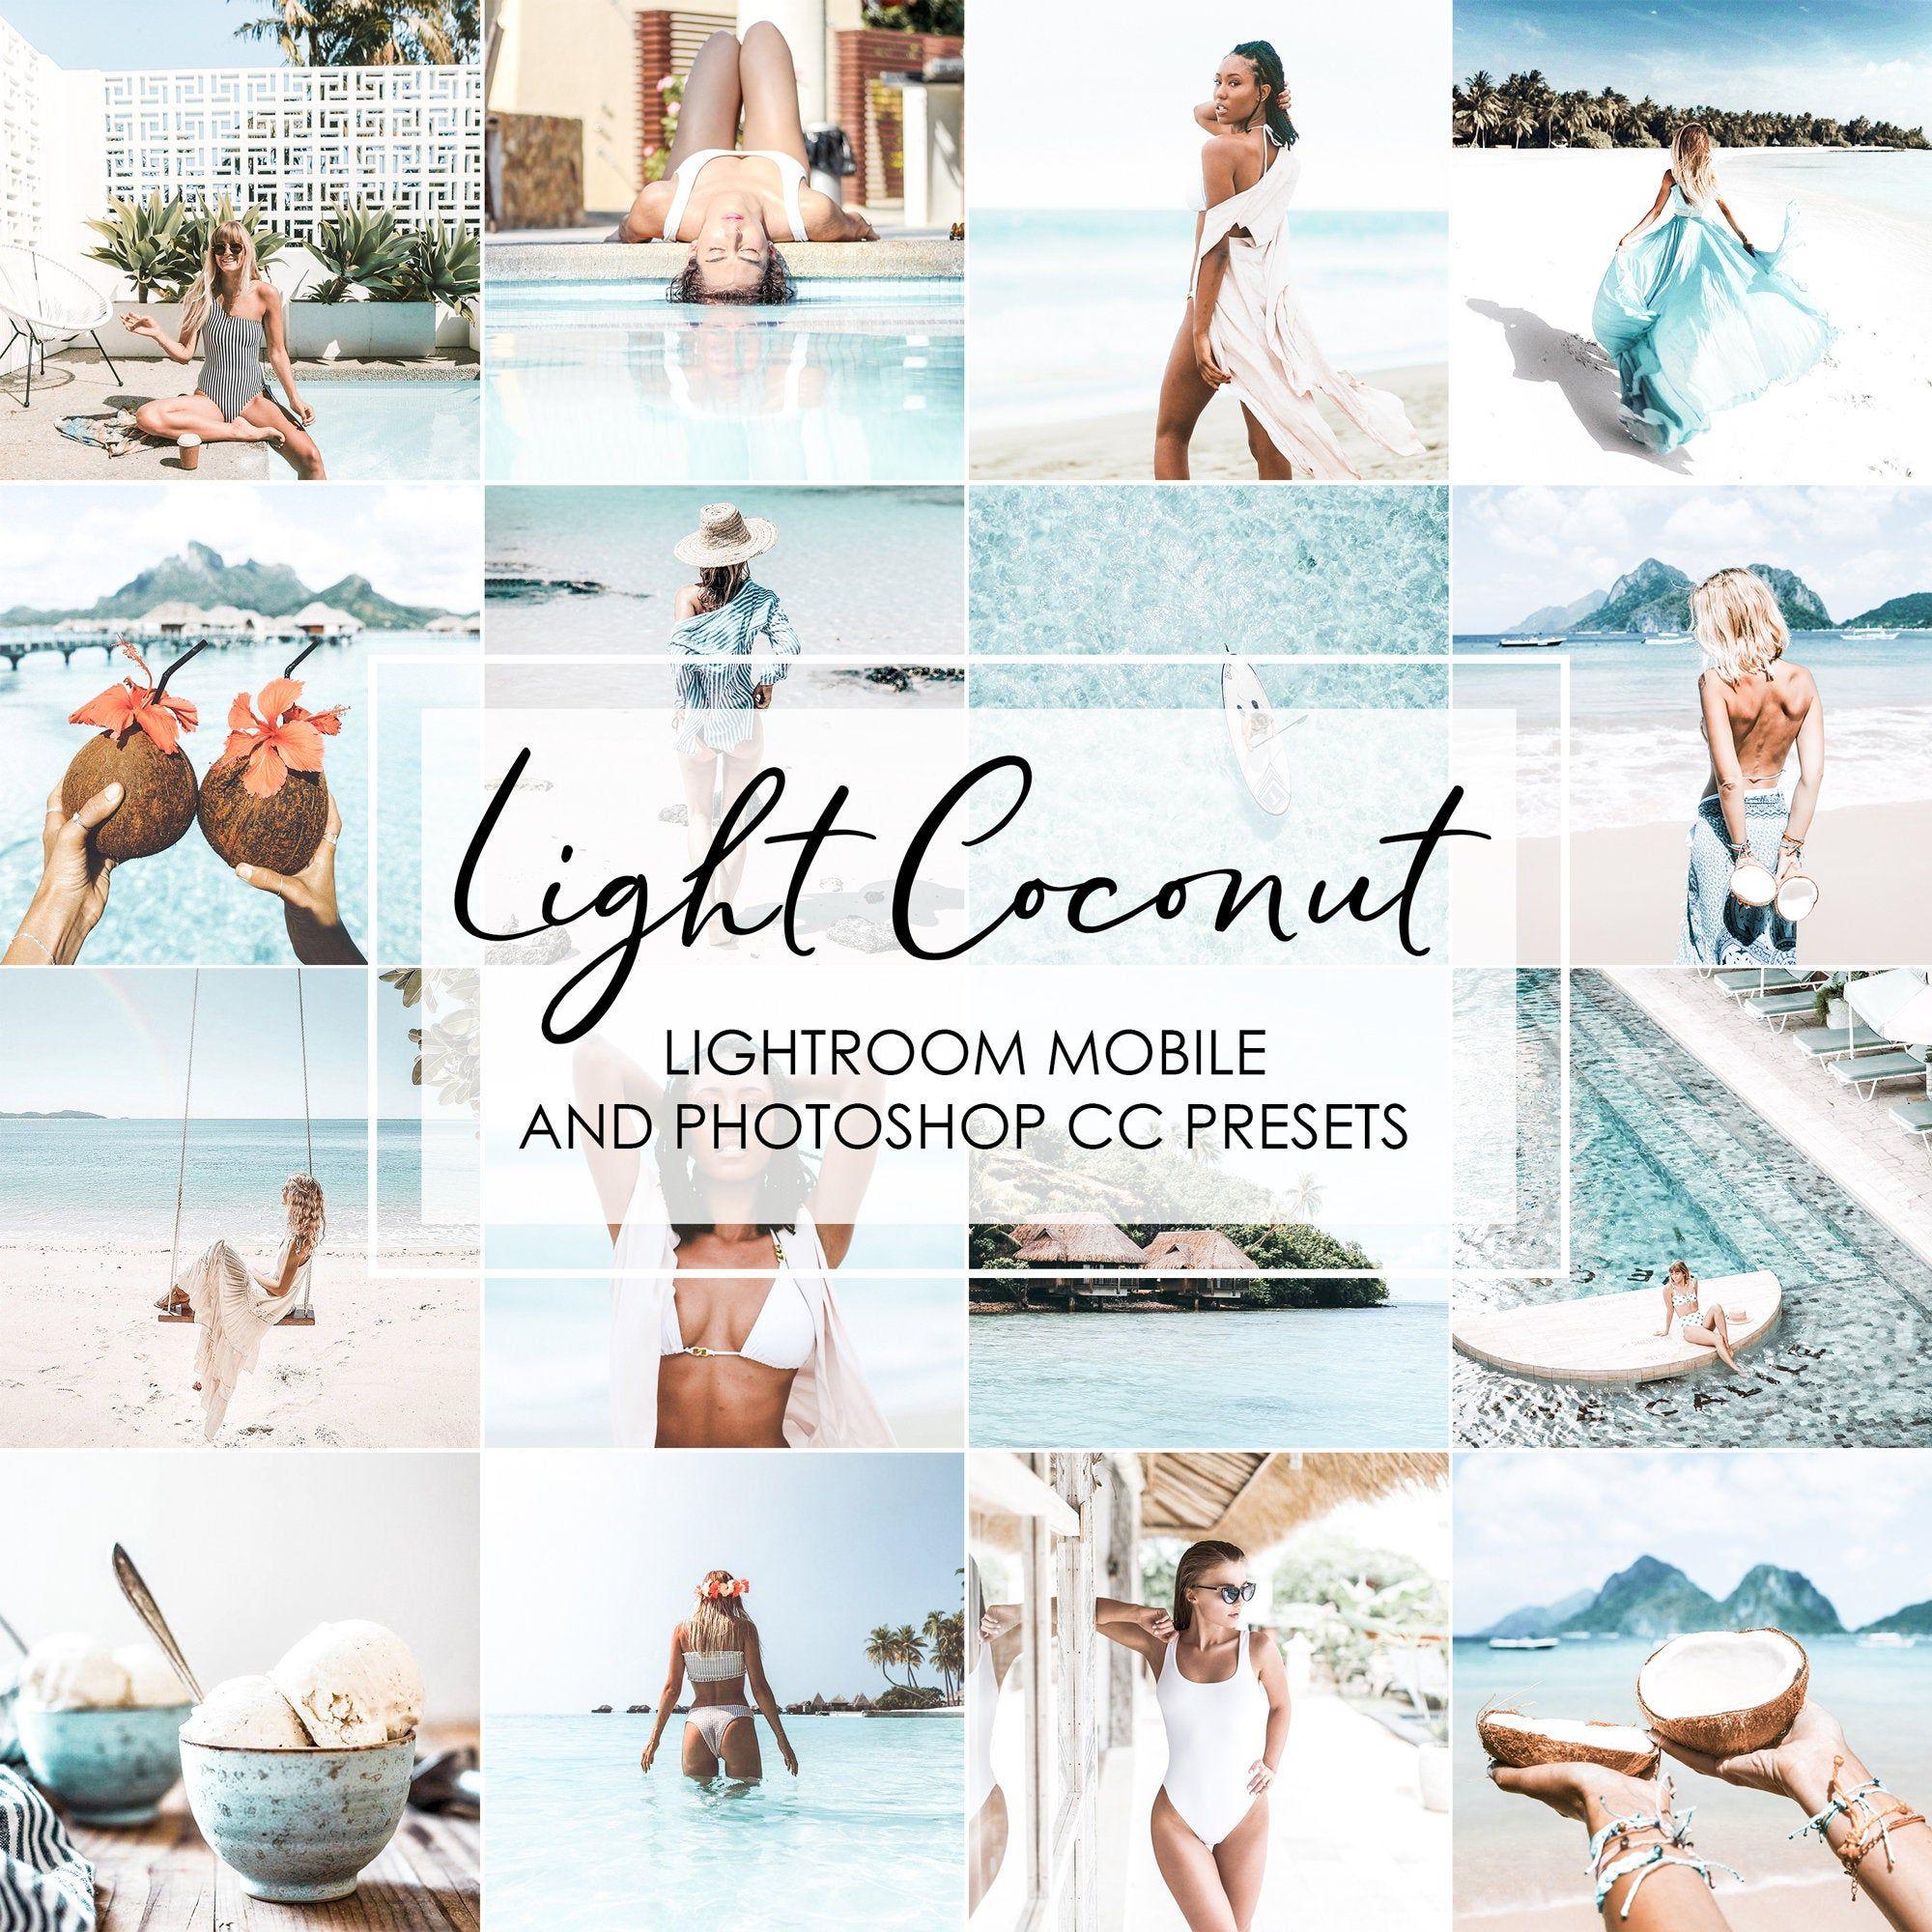 Lightroom Presets 16 Presets LIGHT COCONUT Bright Airy